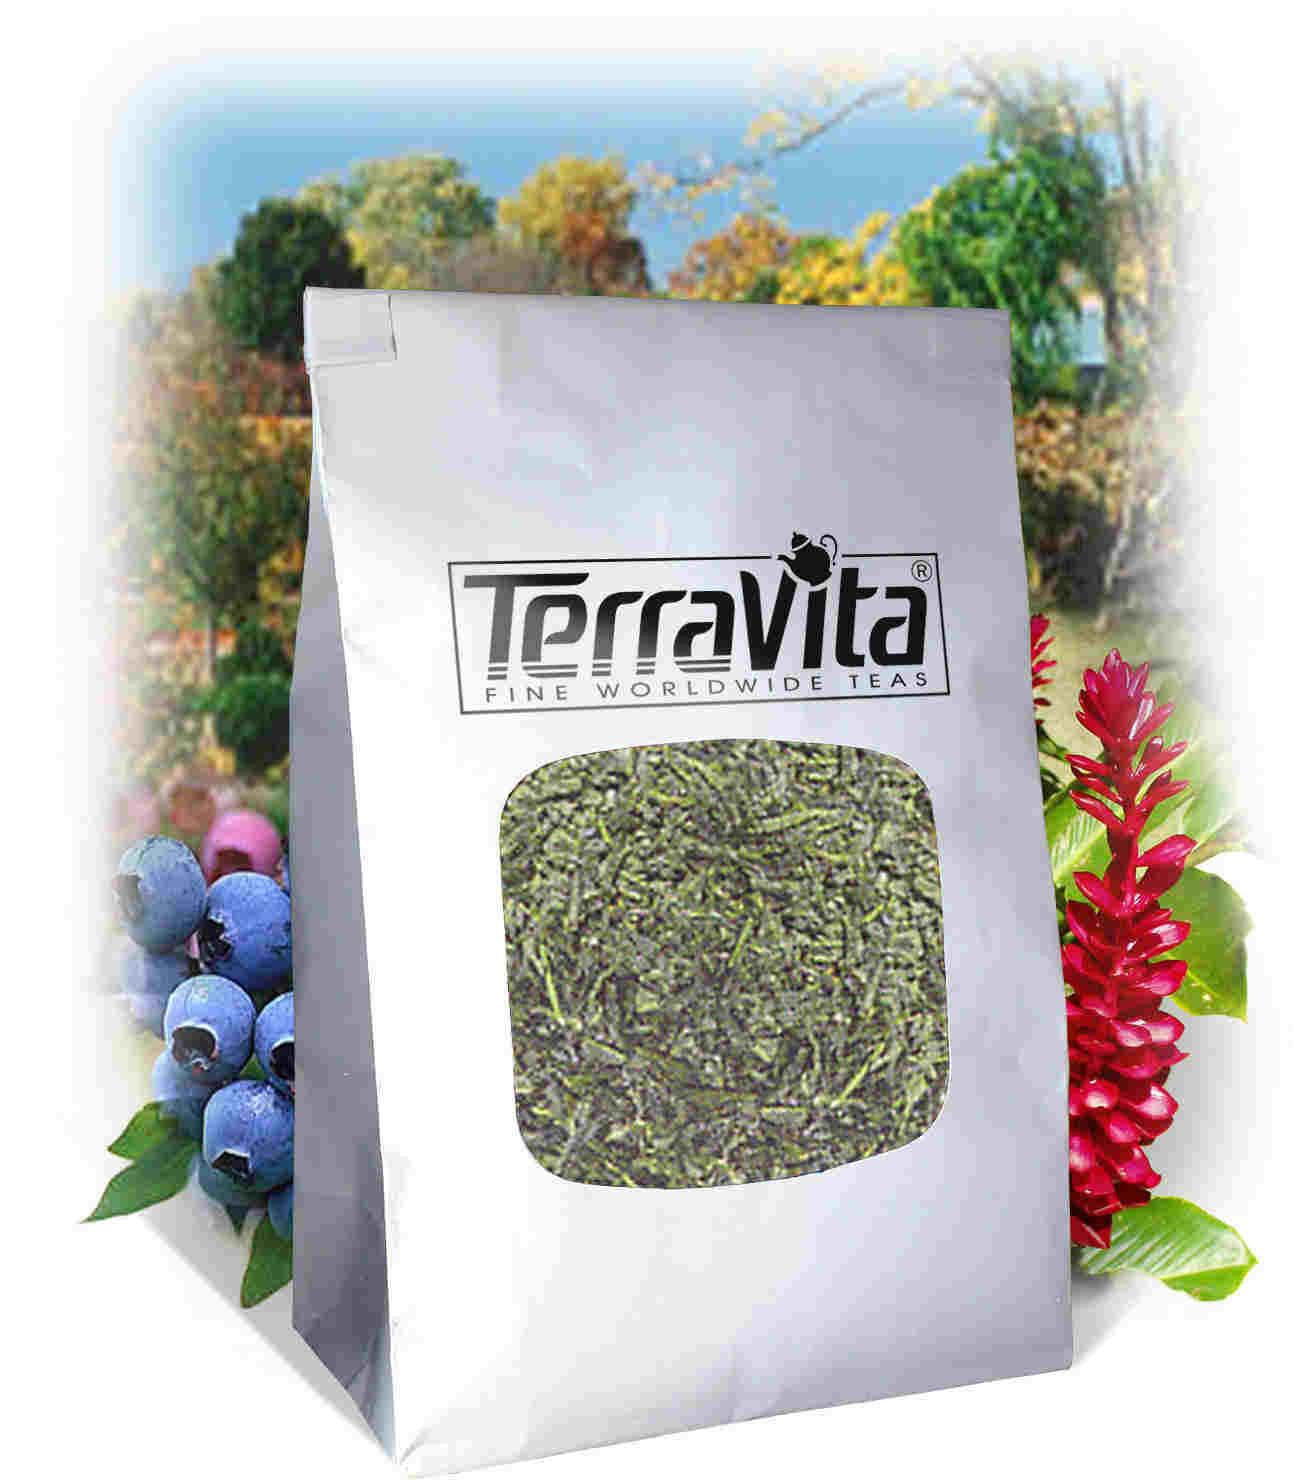 Expectorant Formula - Linden, Eucalyptus, Lemon Balm and More - Tea (Loose)